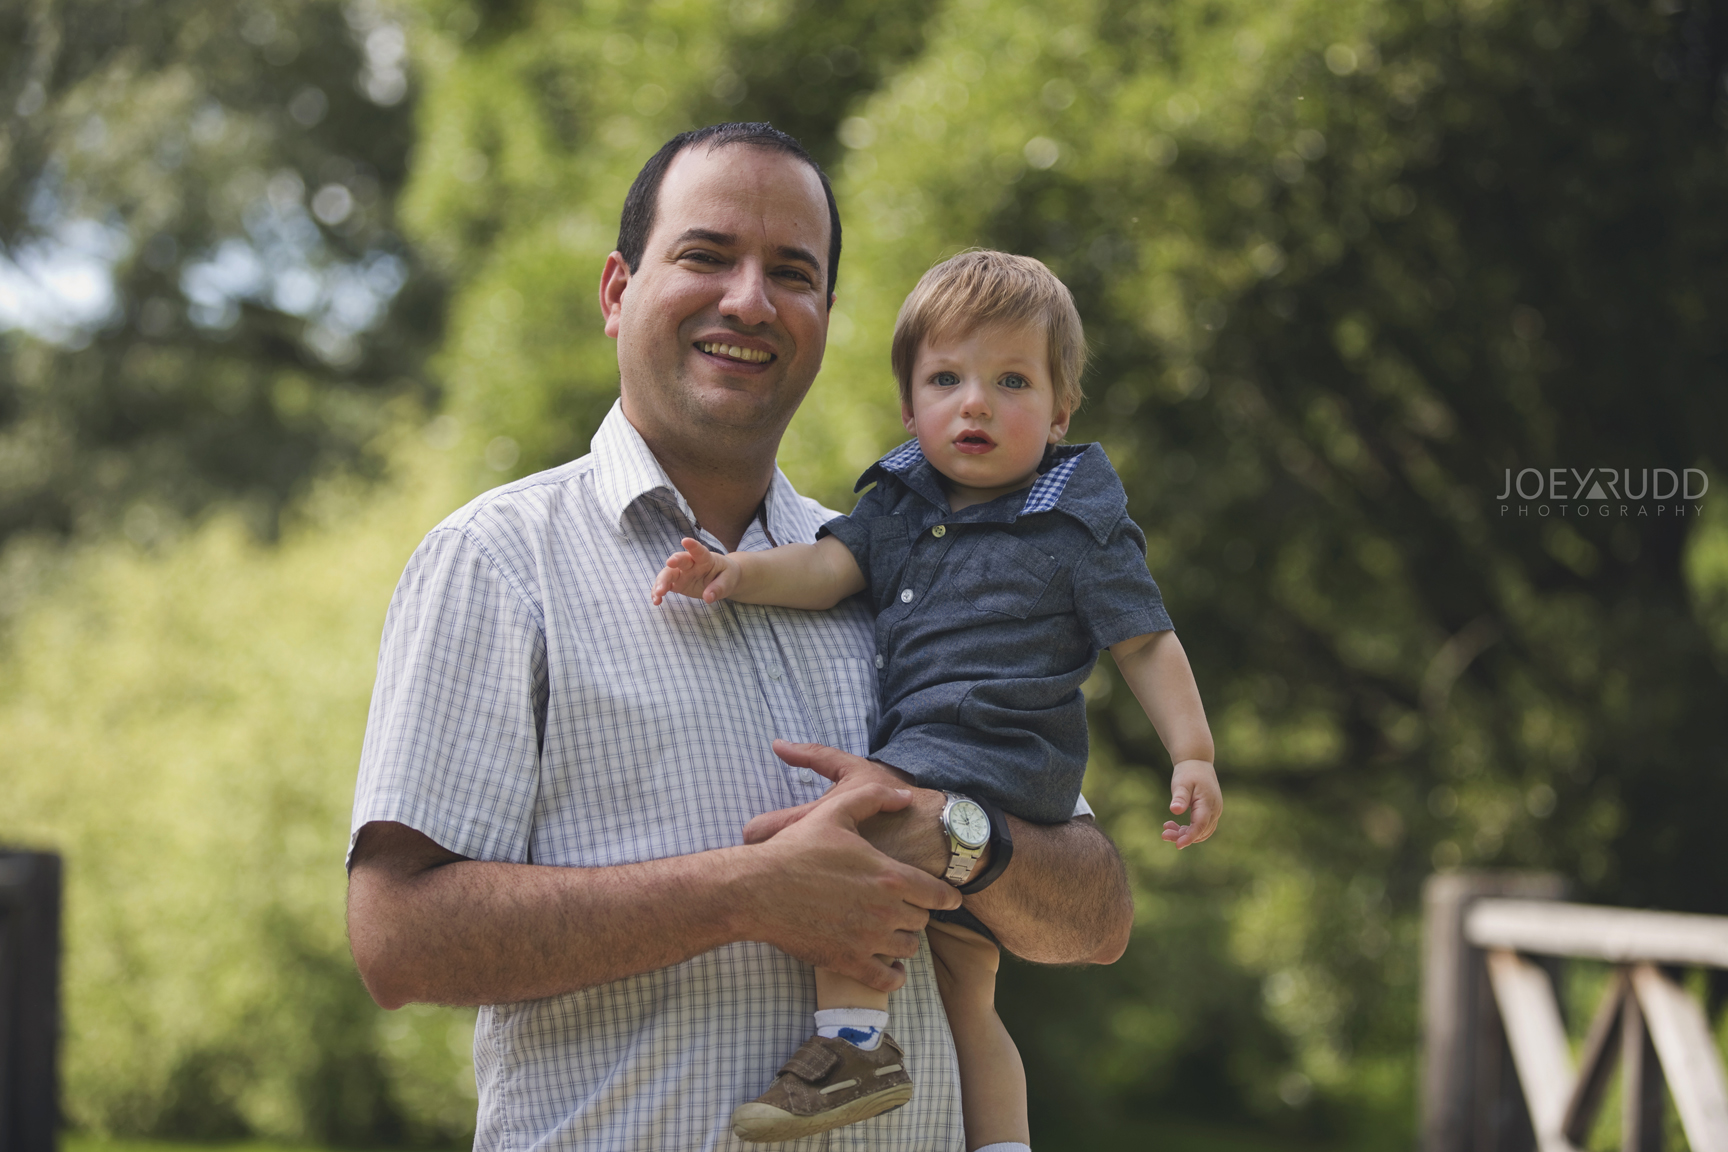 Ottawa Family Photographer Joey Rudd Photography Arboretum Father and Son